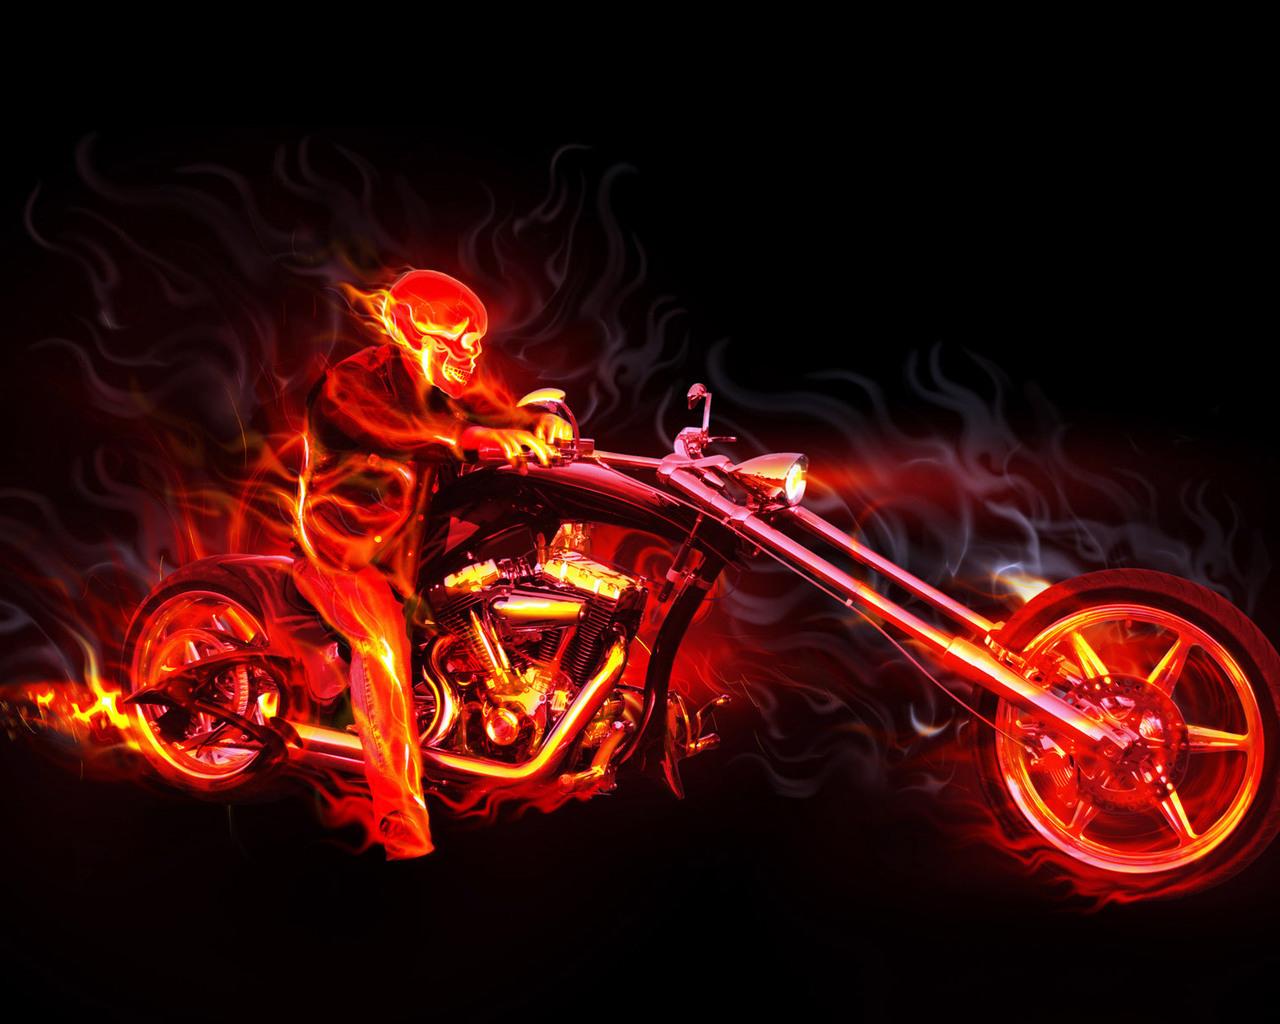 Ghost Rider Wallpaper Download hd wallpaper background desktop 1280x1024